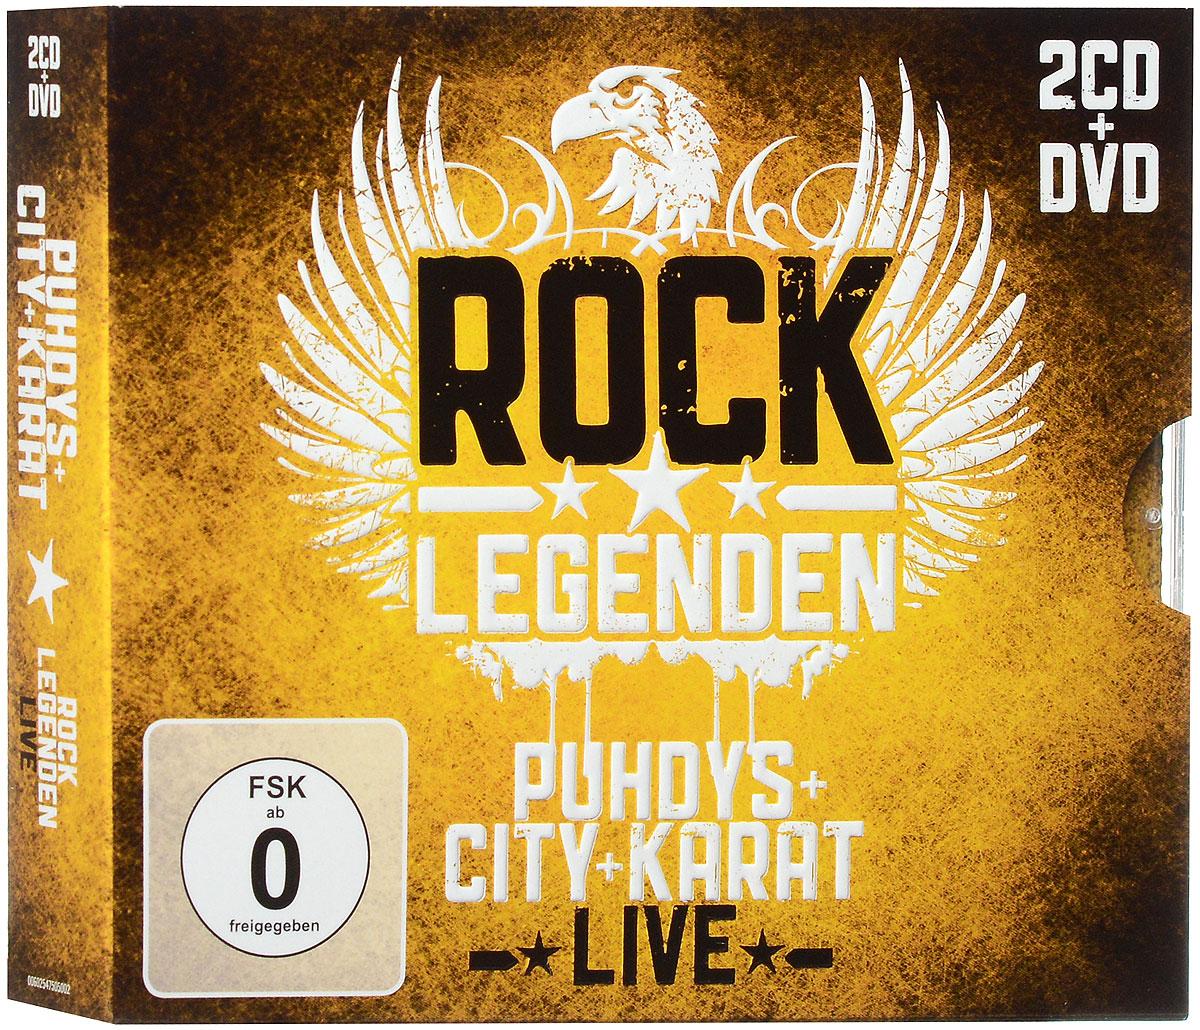 Puhdys + City + Karat. Rock Legenden Live (2 CD + DVD)